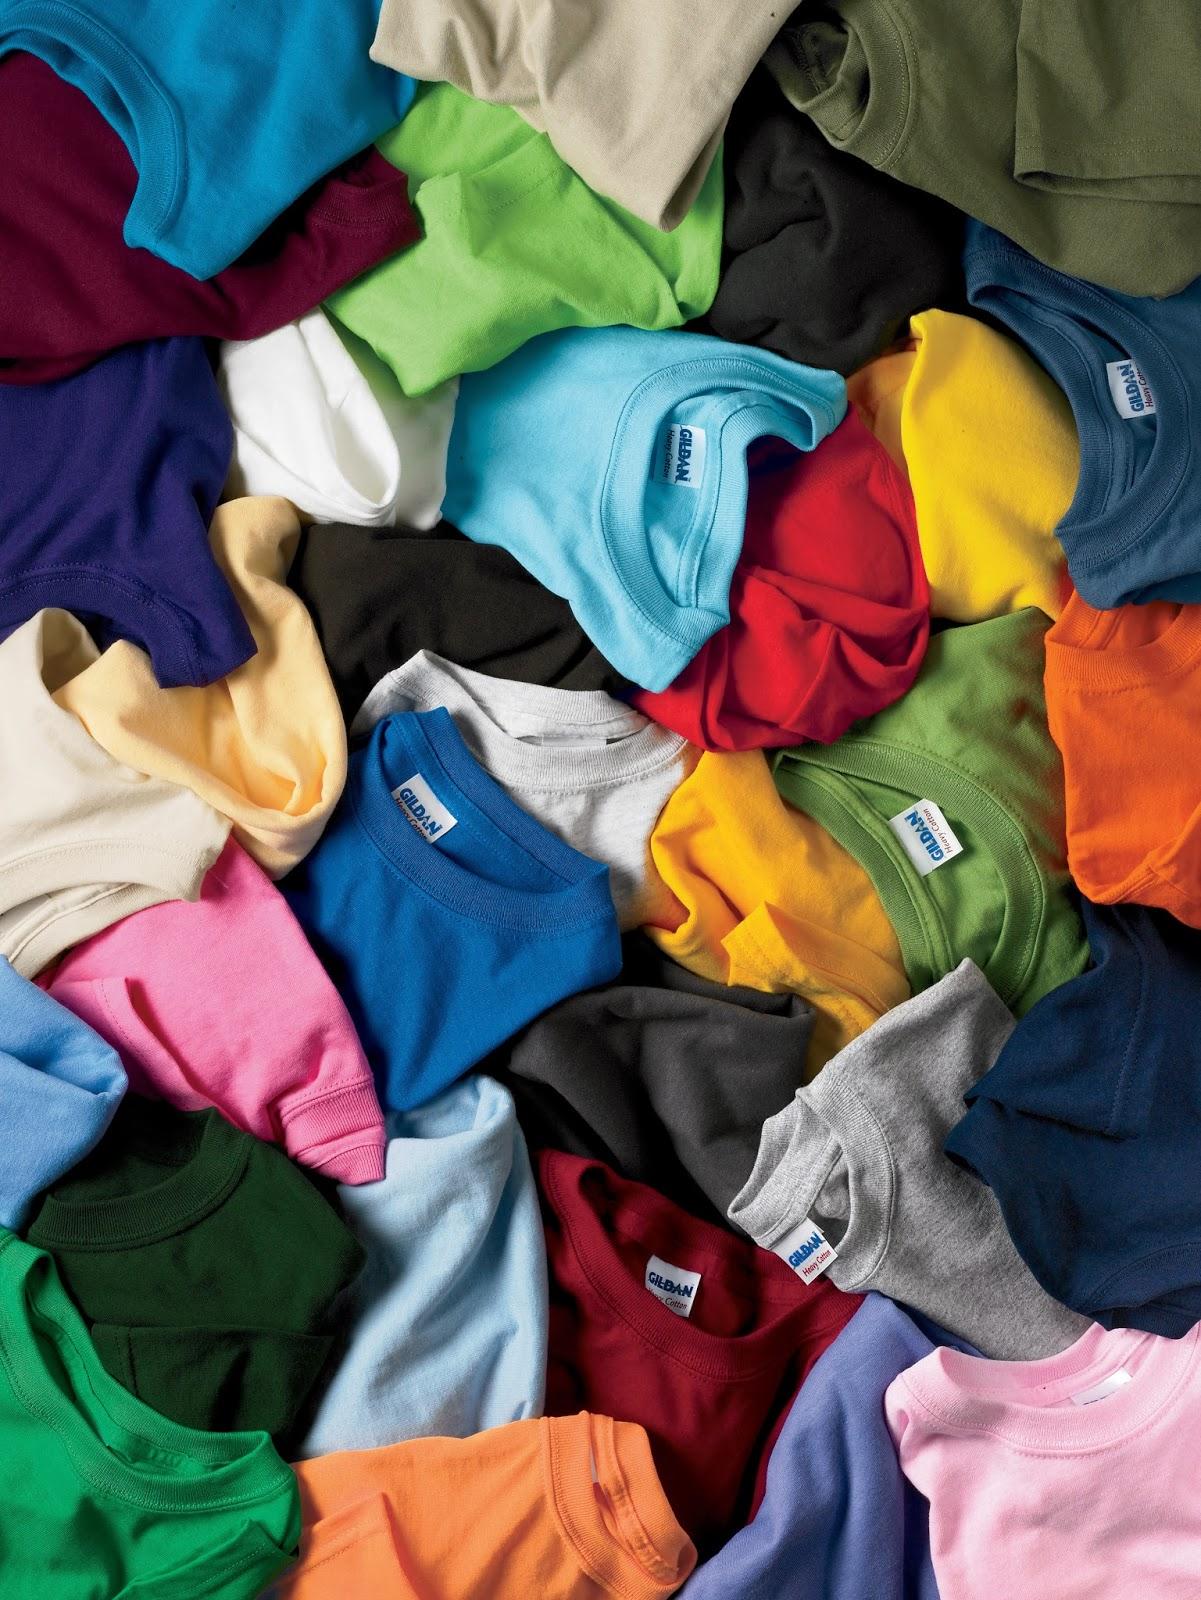 t-shirt design ideas Archives | The Shirt Printer